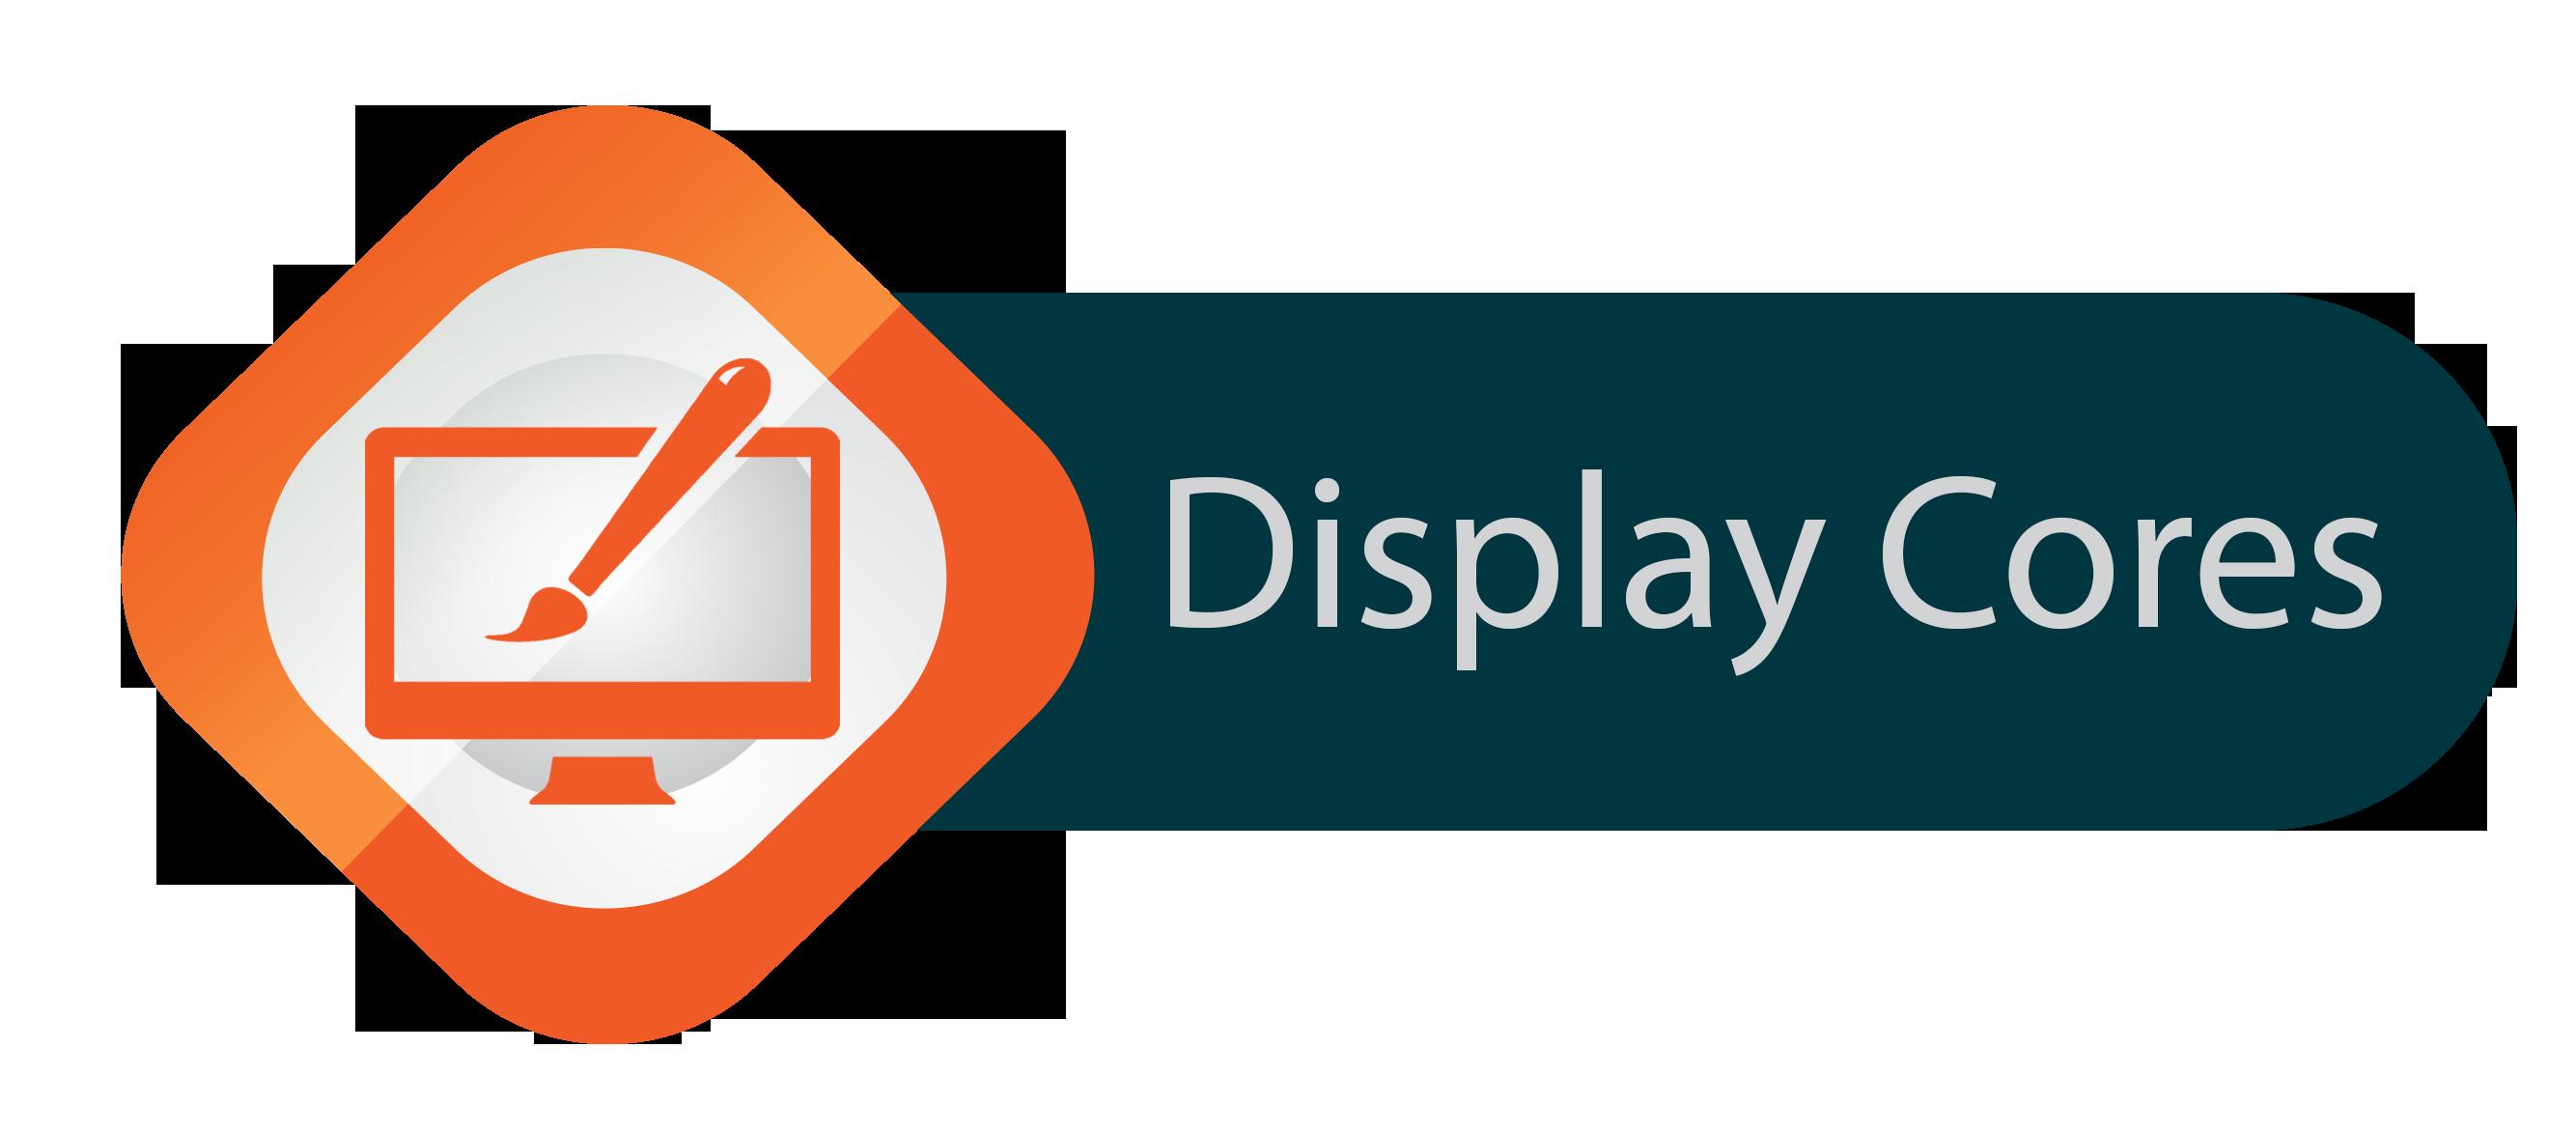 display_cores_tecnico_terminal_probio_controlo_acessos_assiduidade